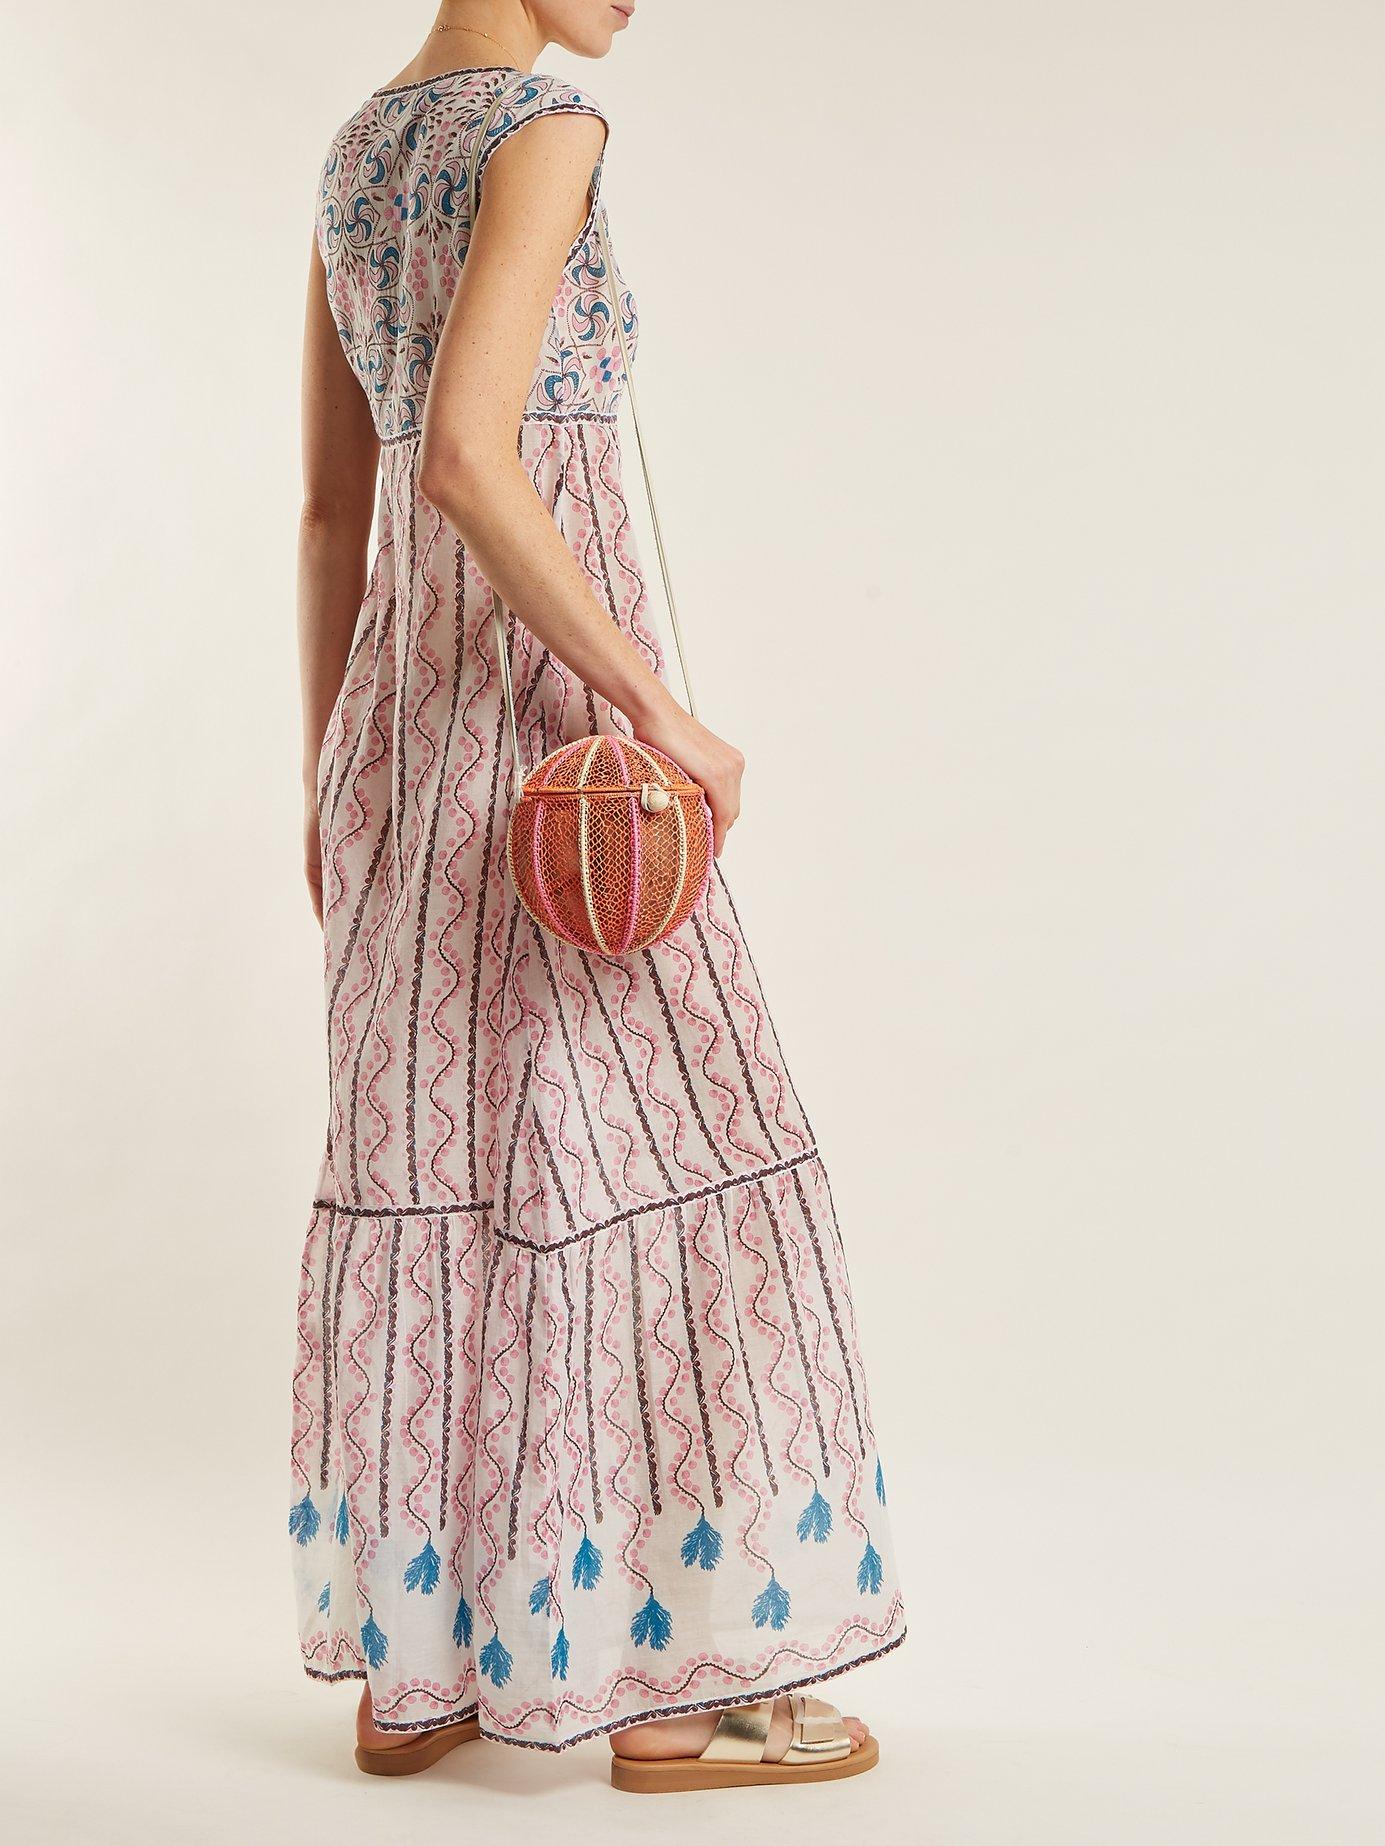 Astrid Kantha-Shell-print sleeveless maxi dress by Le Sirenuse, Positano